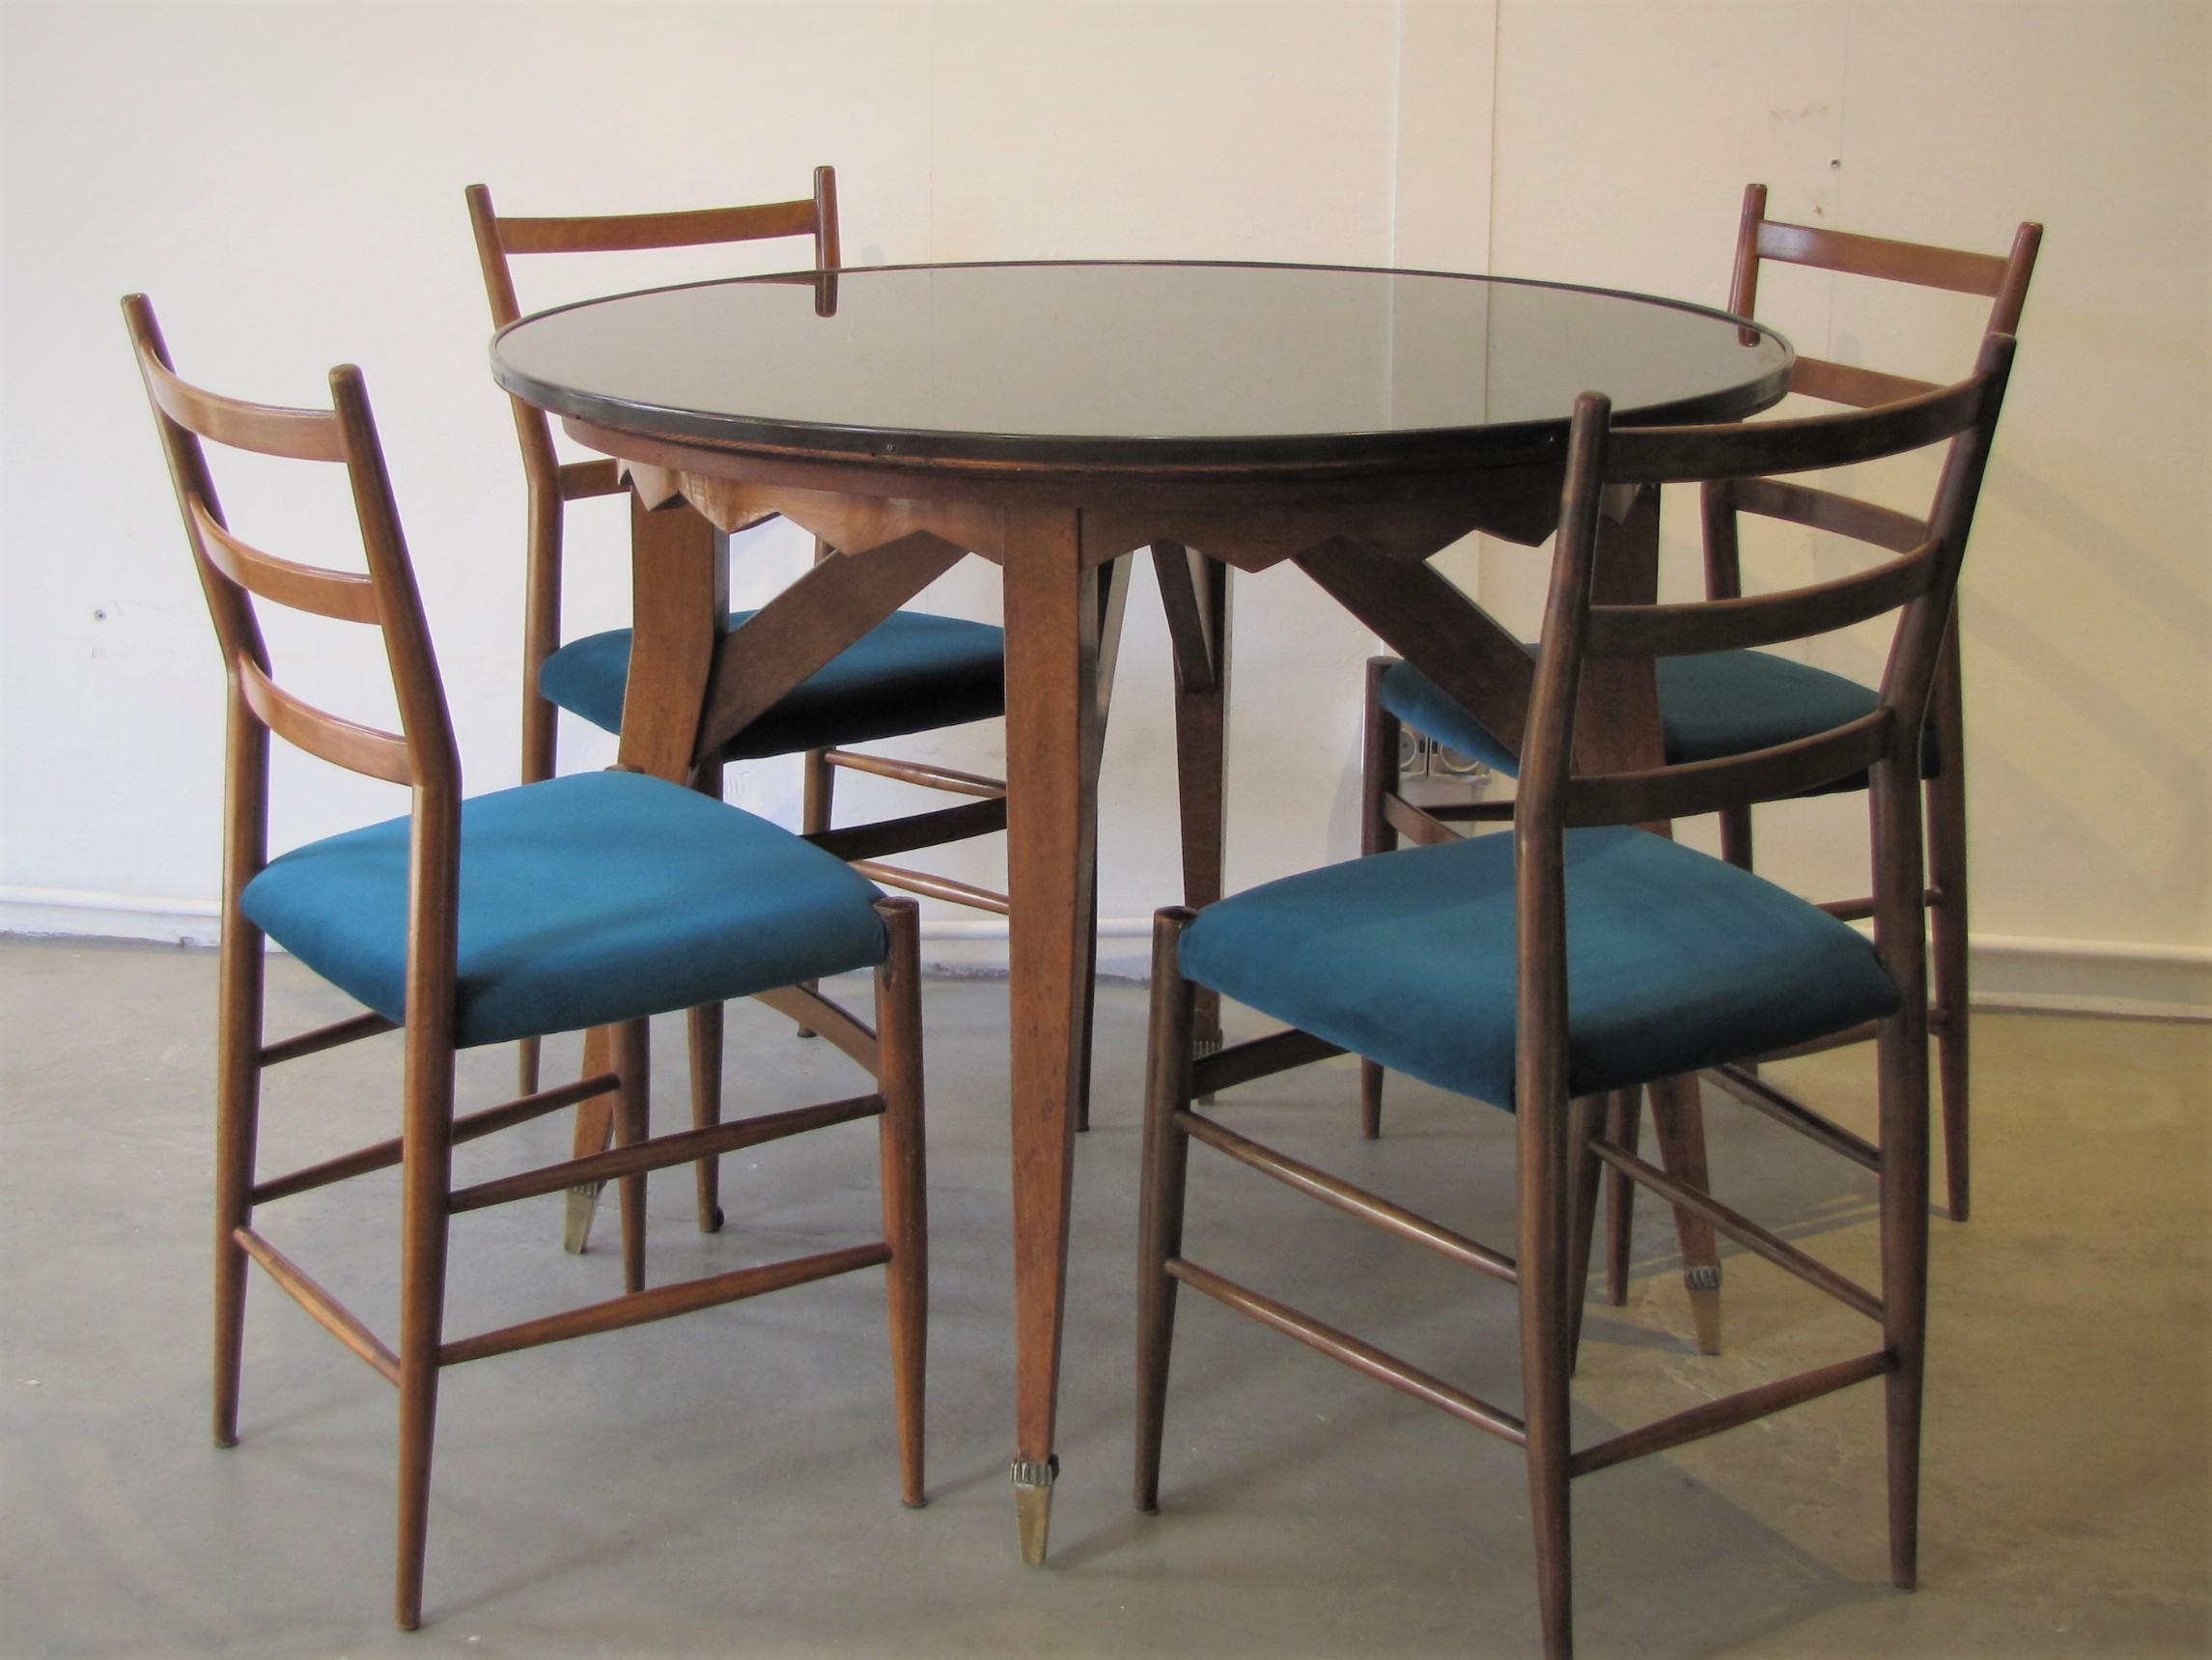 Table haute travail italien, dans le style de Paolo Buffa